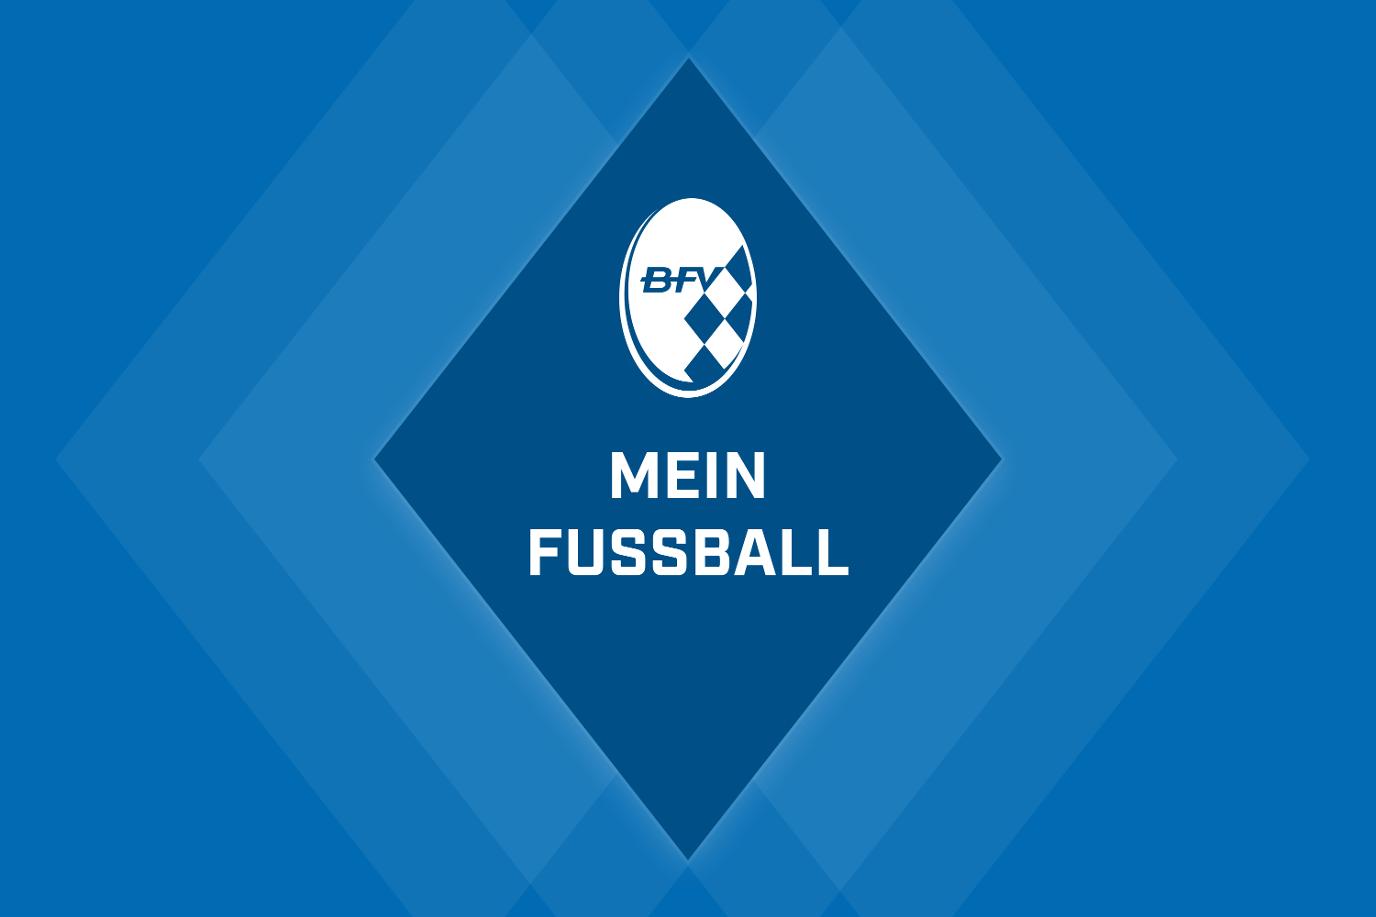 (c) Ergebnisse.bfv.de